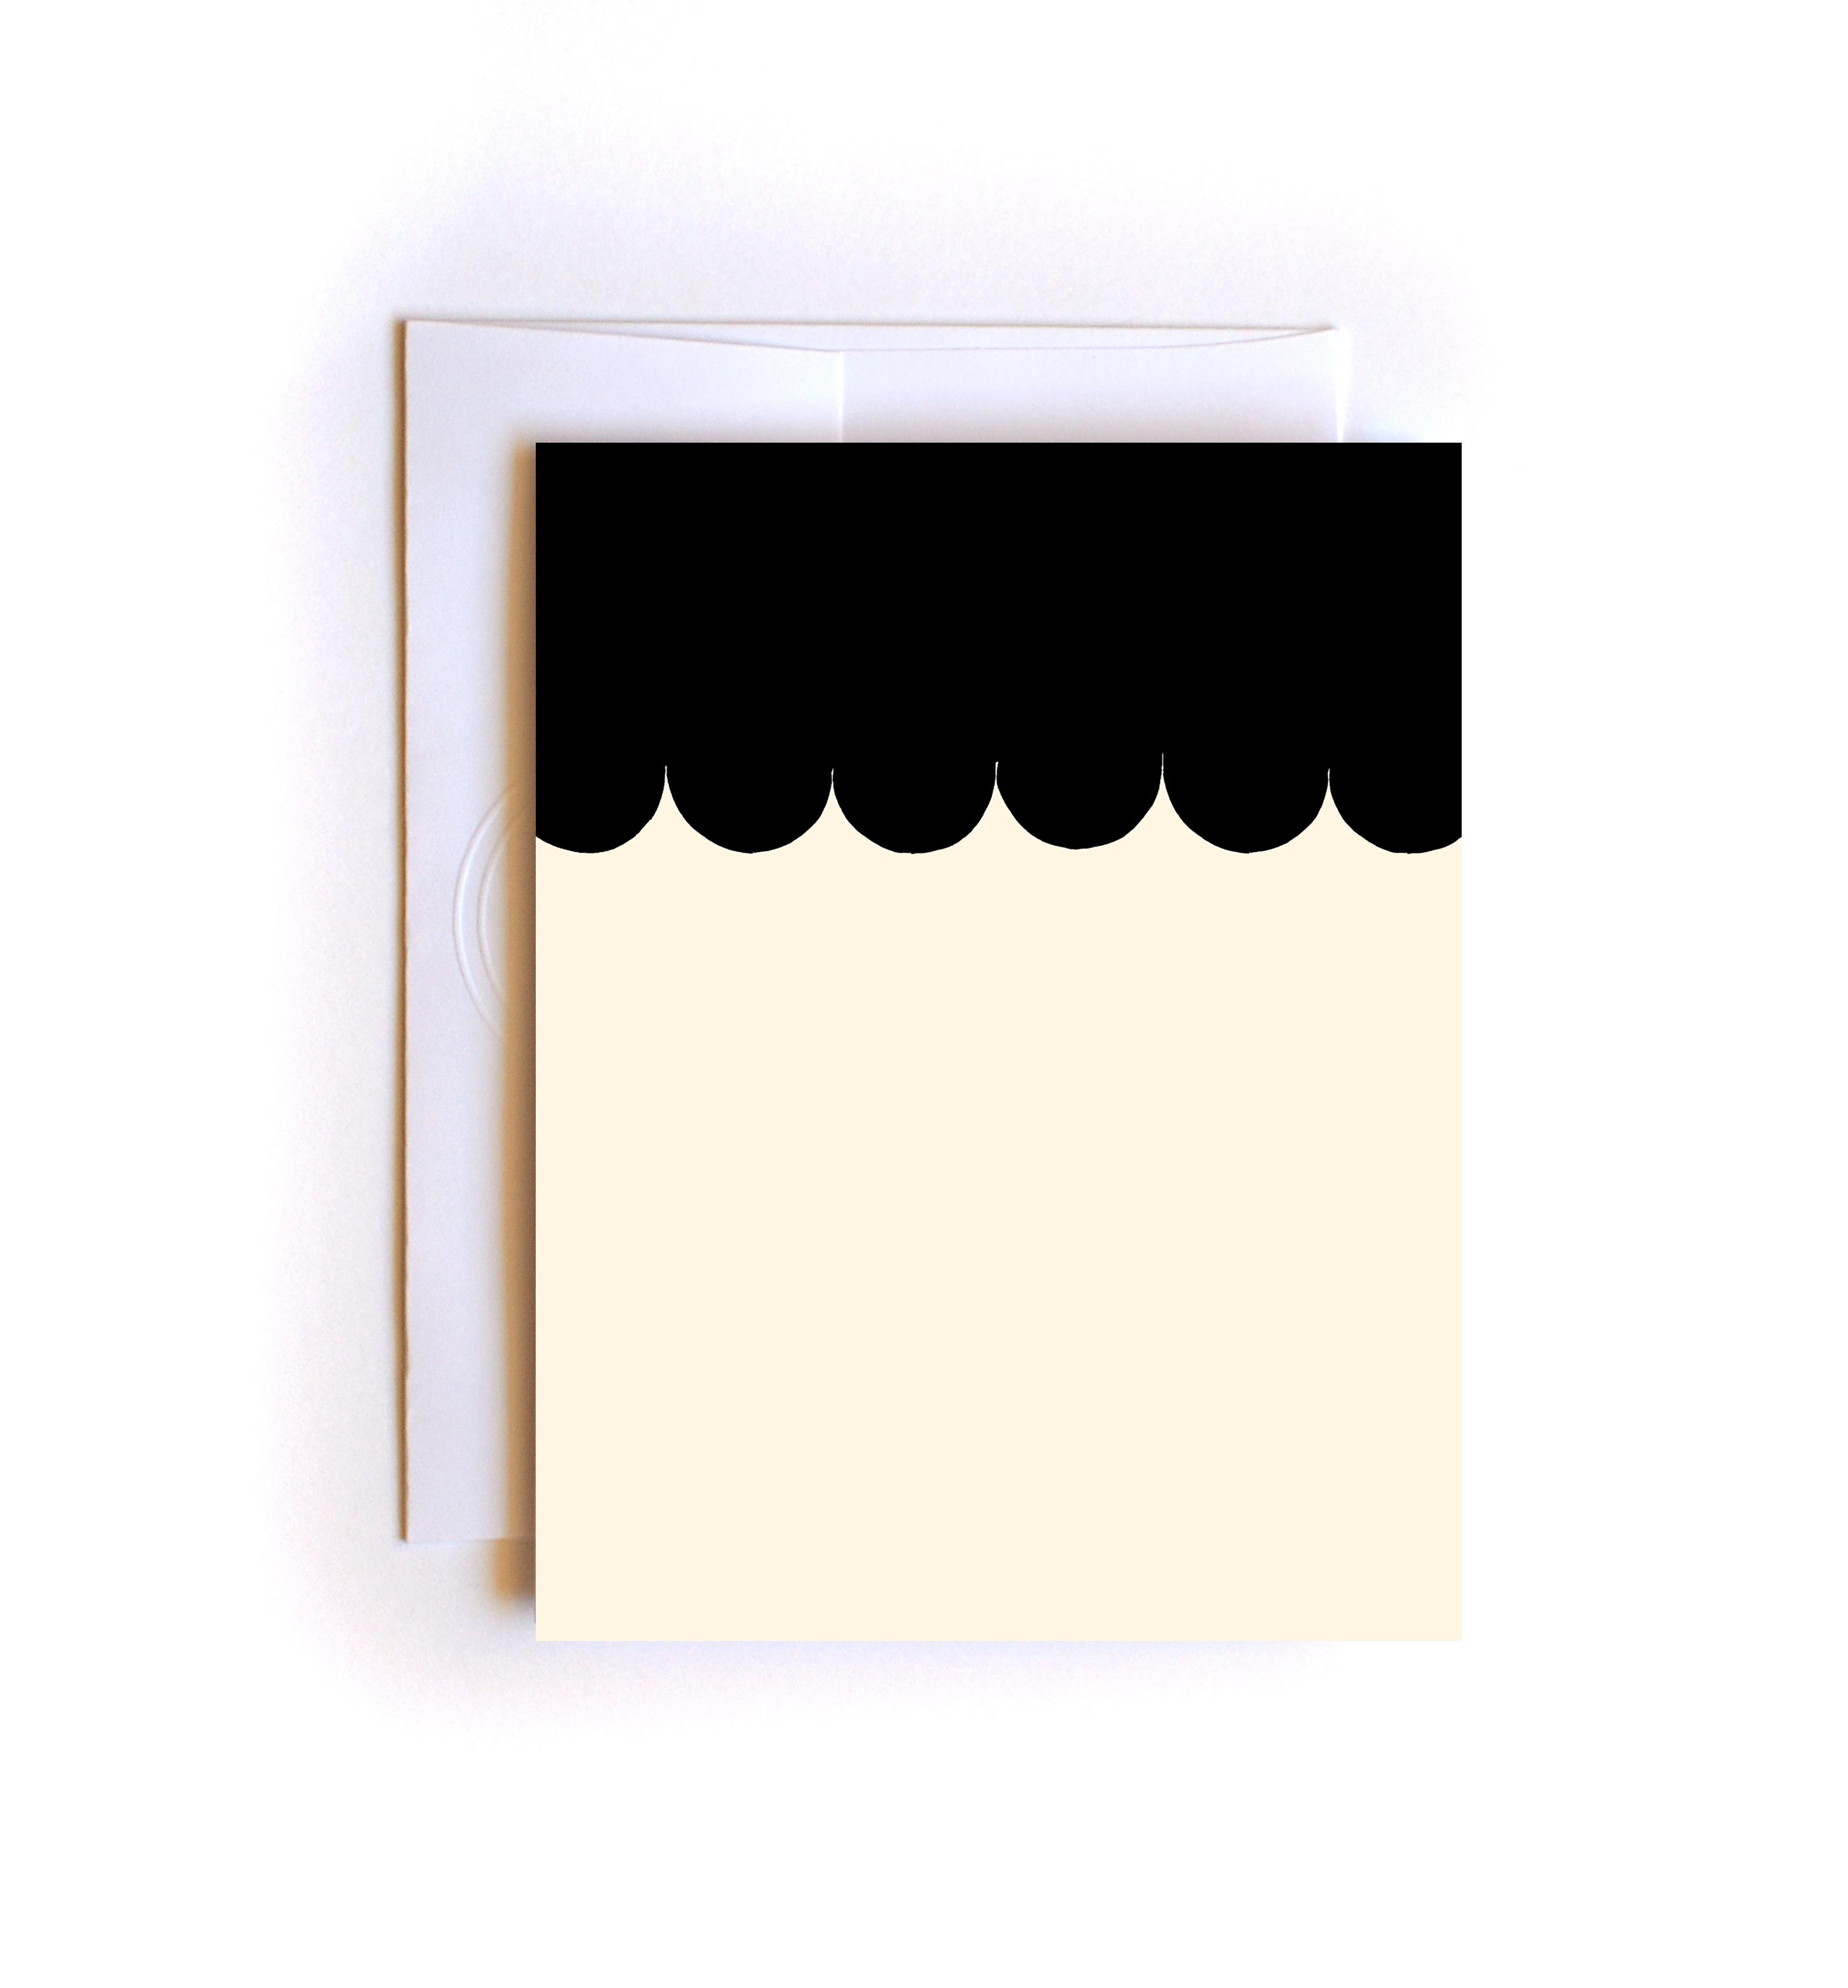 hand drawn scallops card blank card birthday card thank you